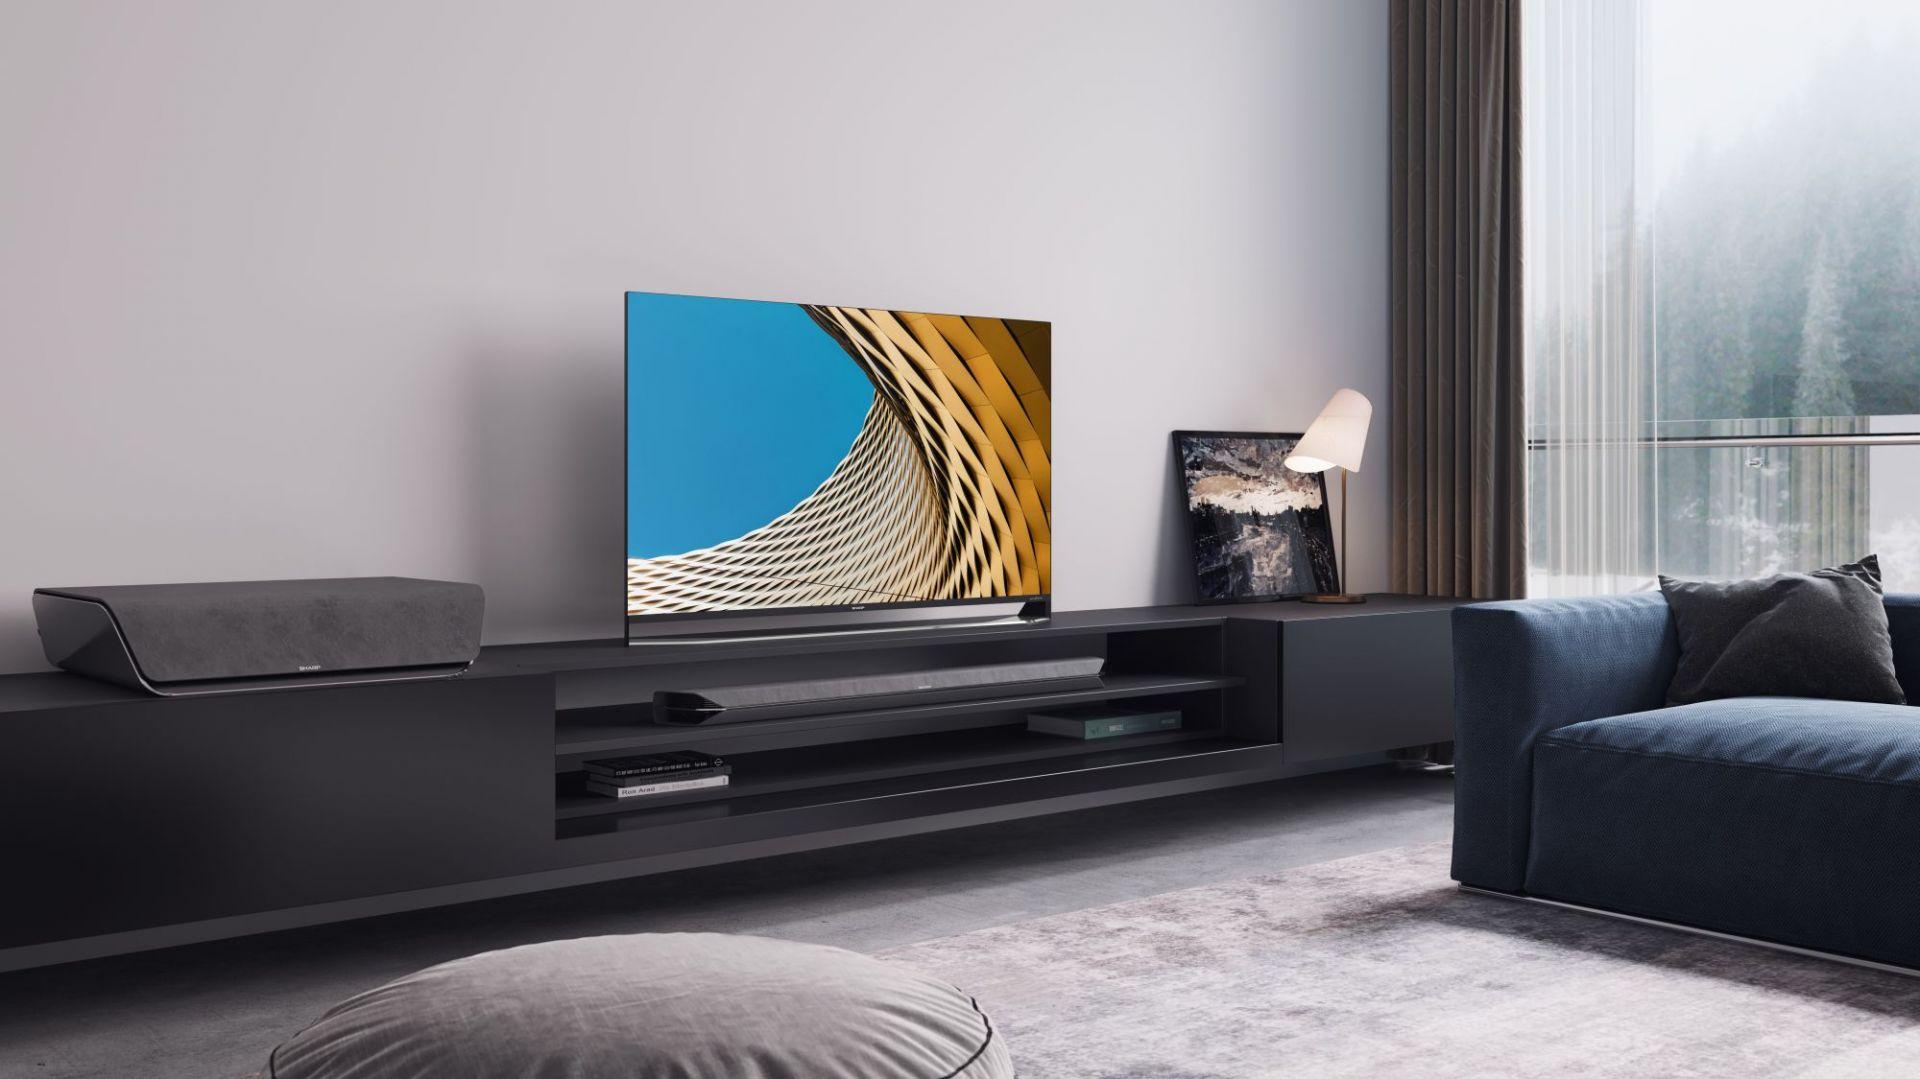 Nowoczesny telewizor. Fot. Pininfarina/Sharp